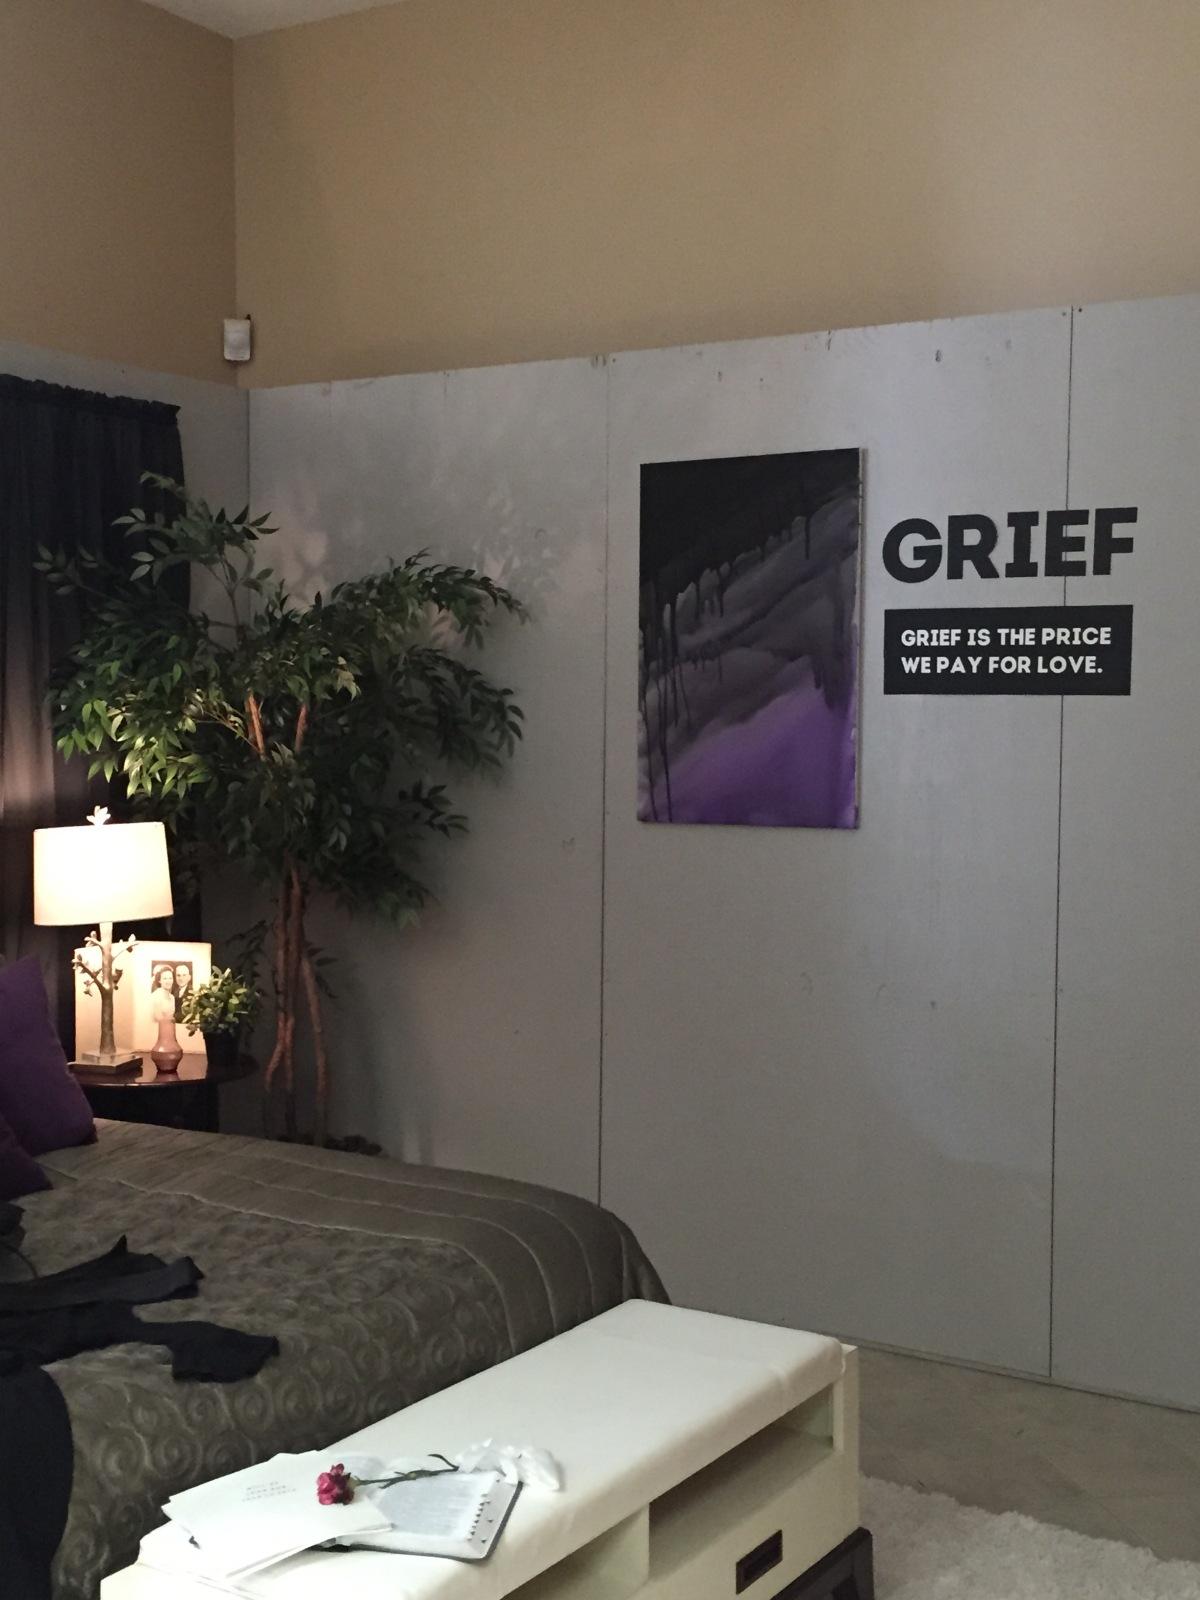 Grief we meetagain…